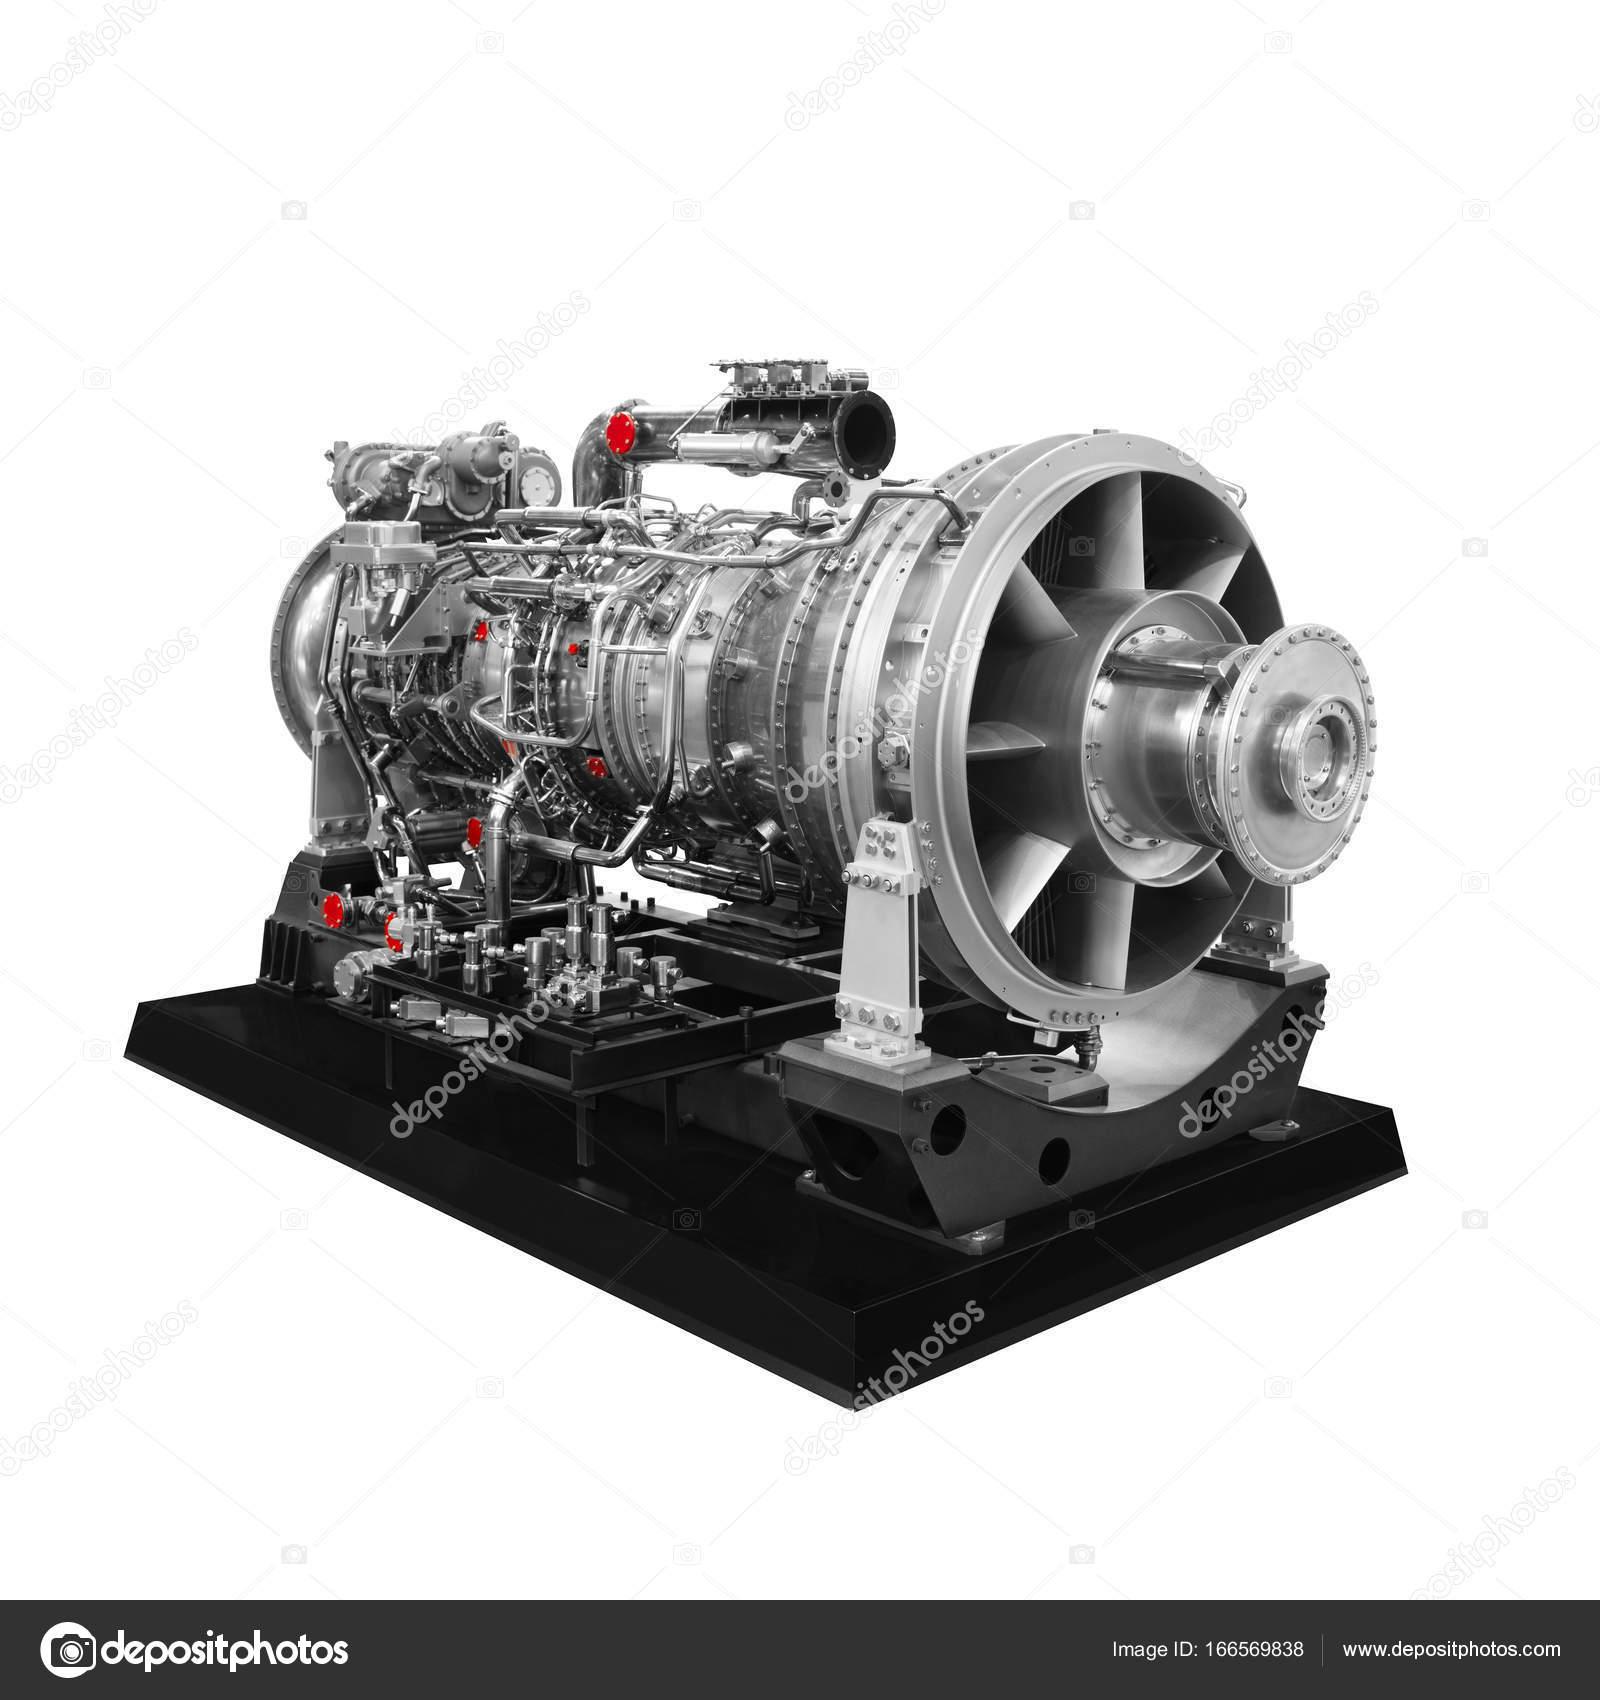 Gas turbine aircraft engine isolated on white background — Stock